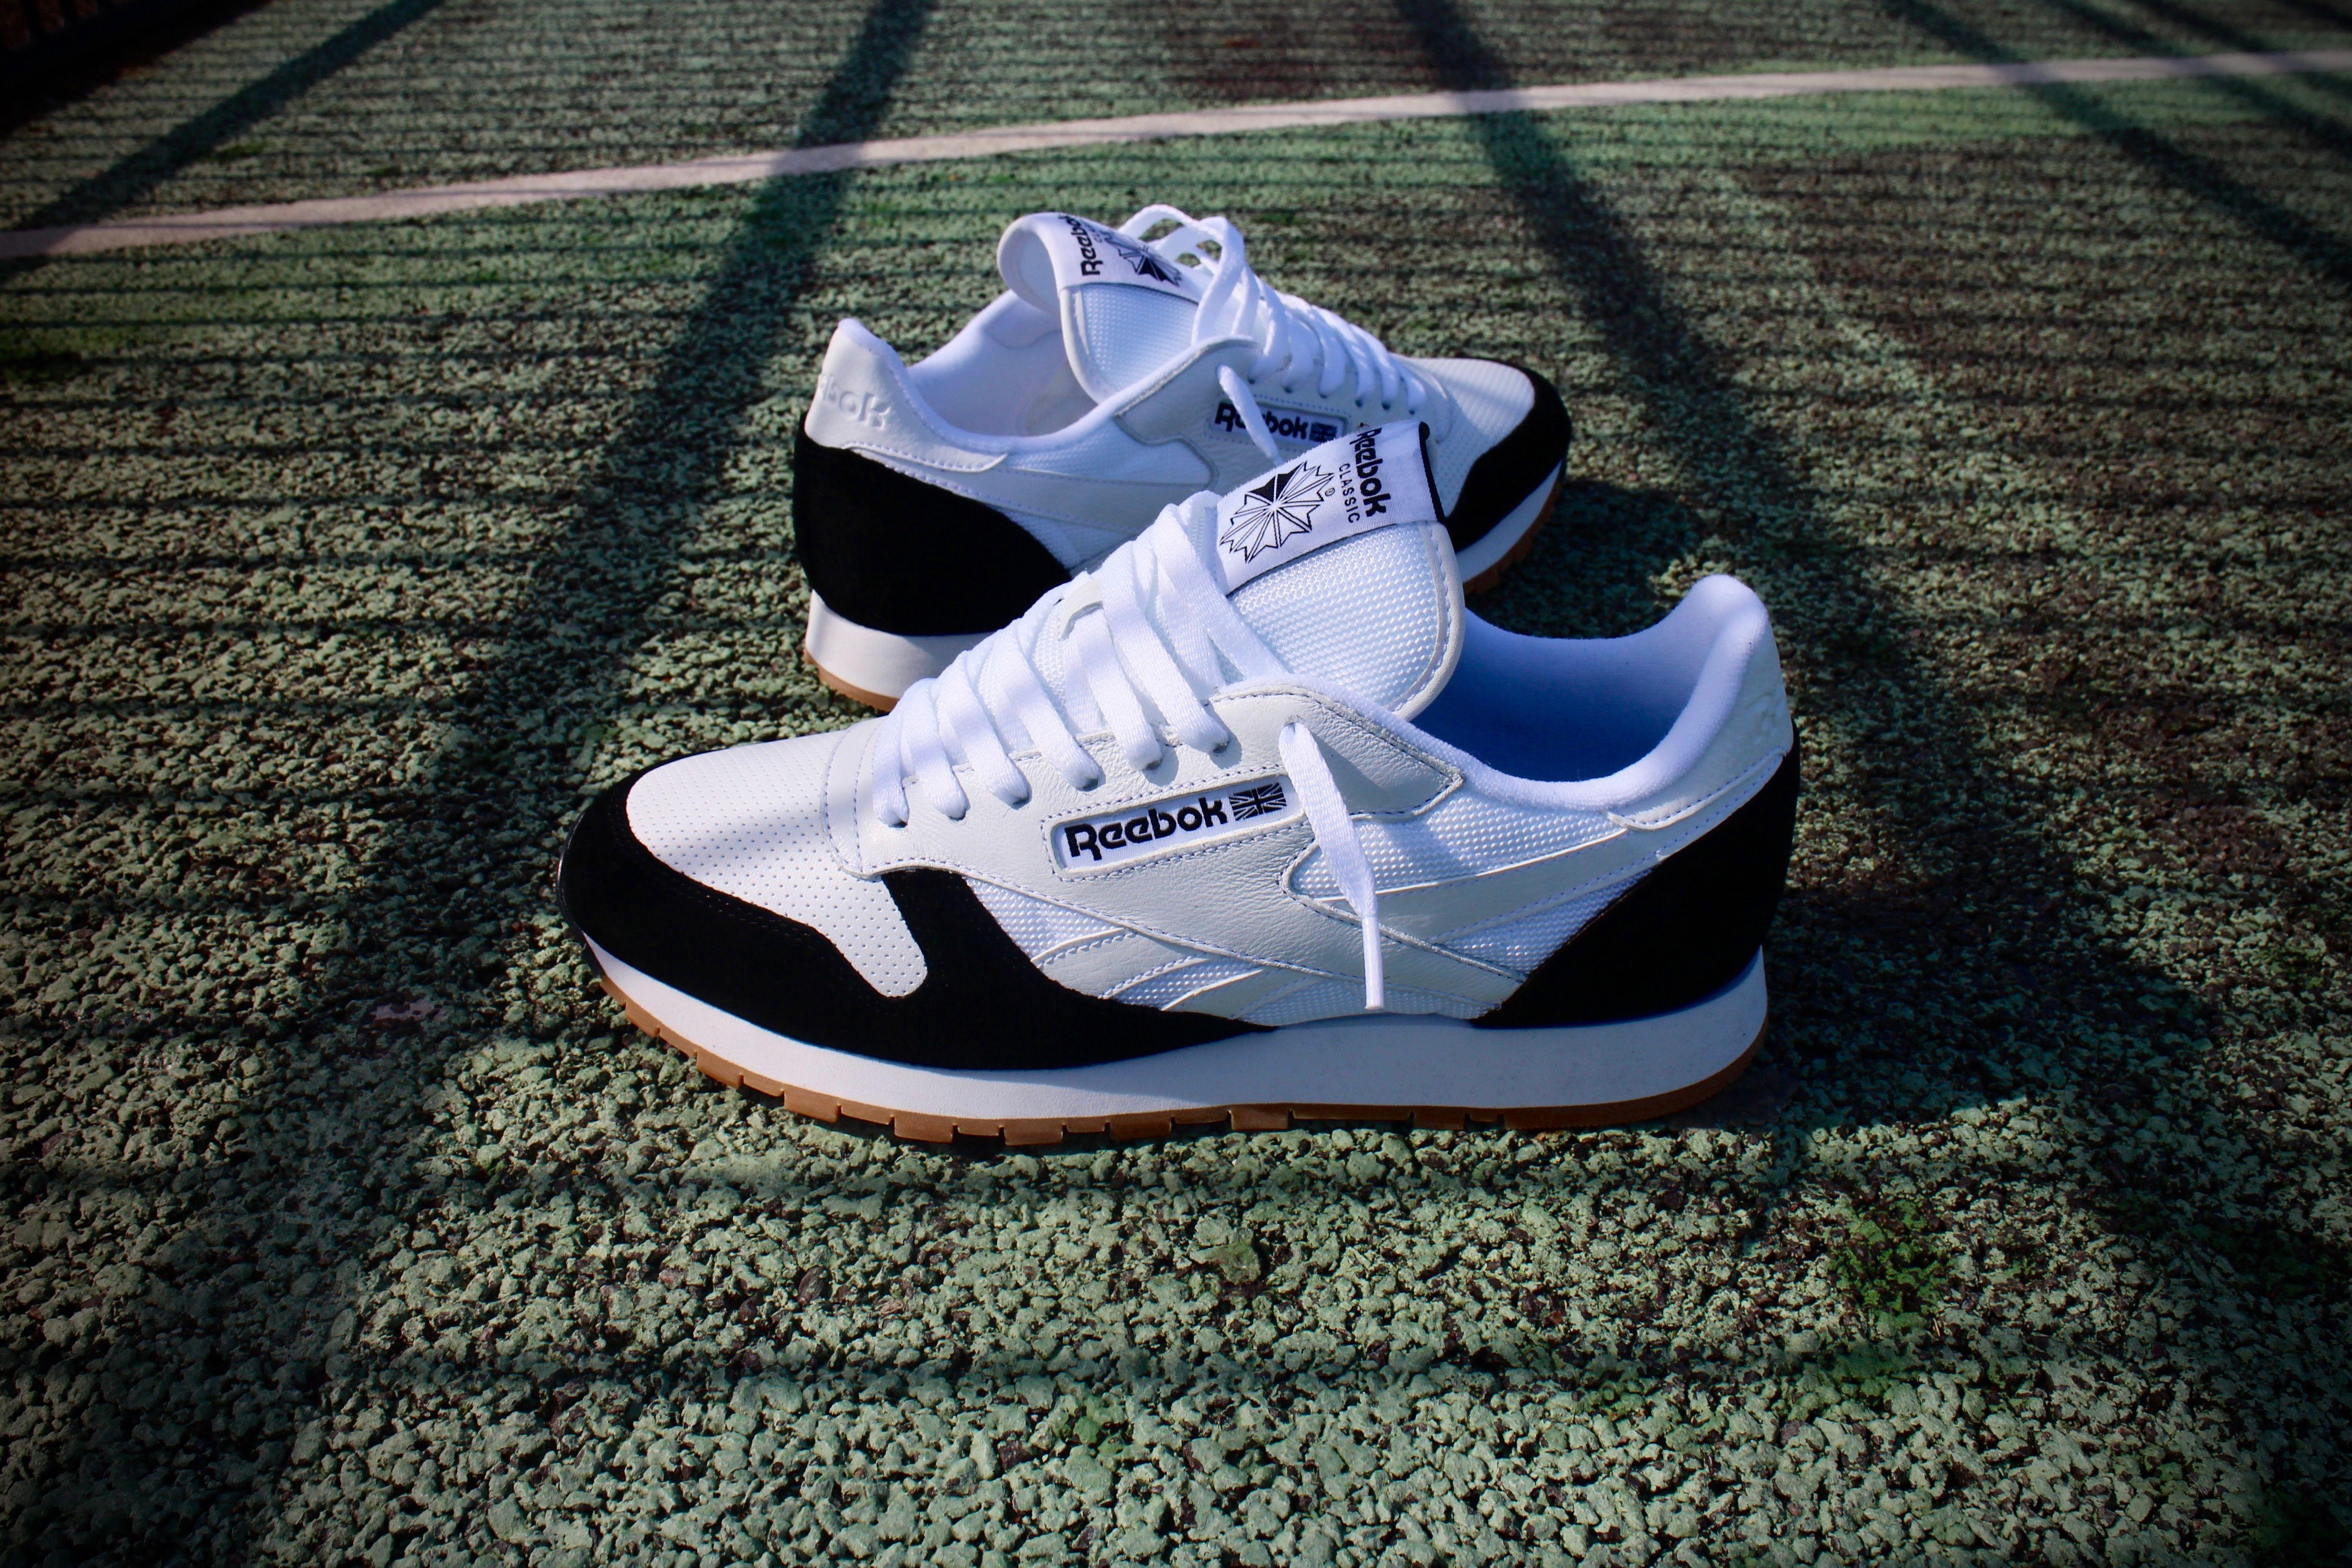 Reebok Classic Leather x Kendrick Lamar Sneaker Spotlight